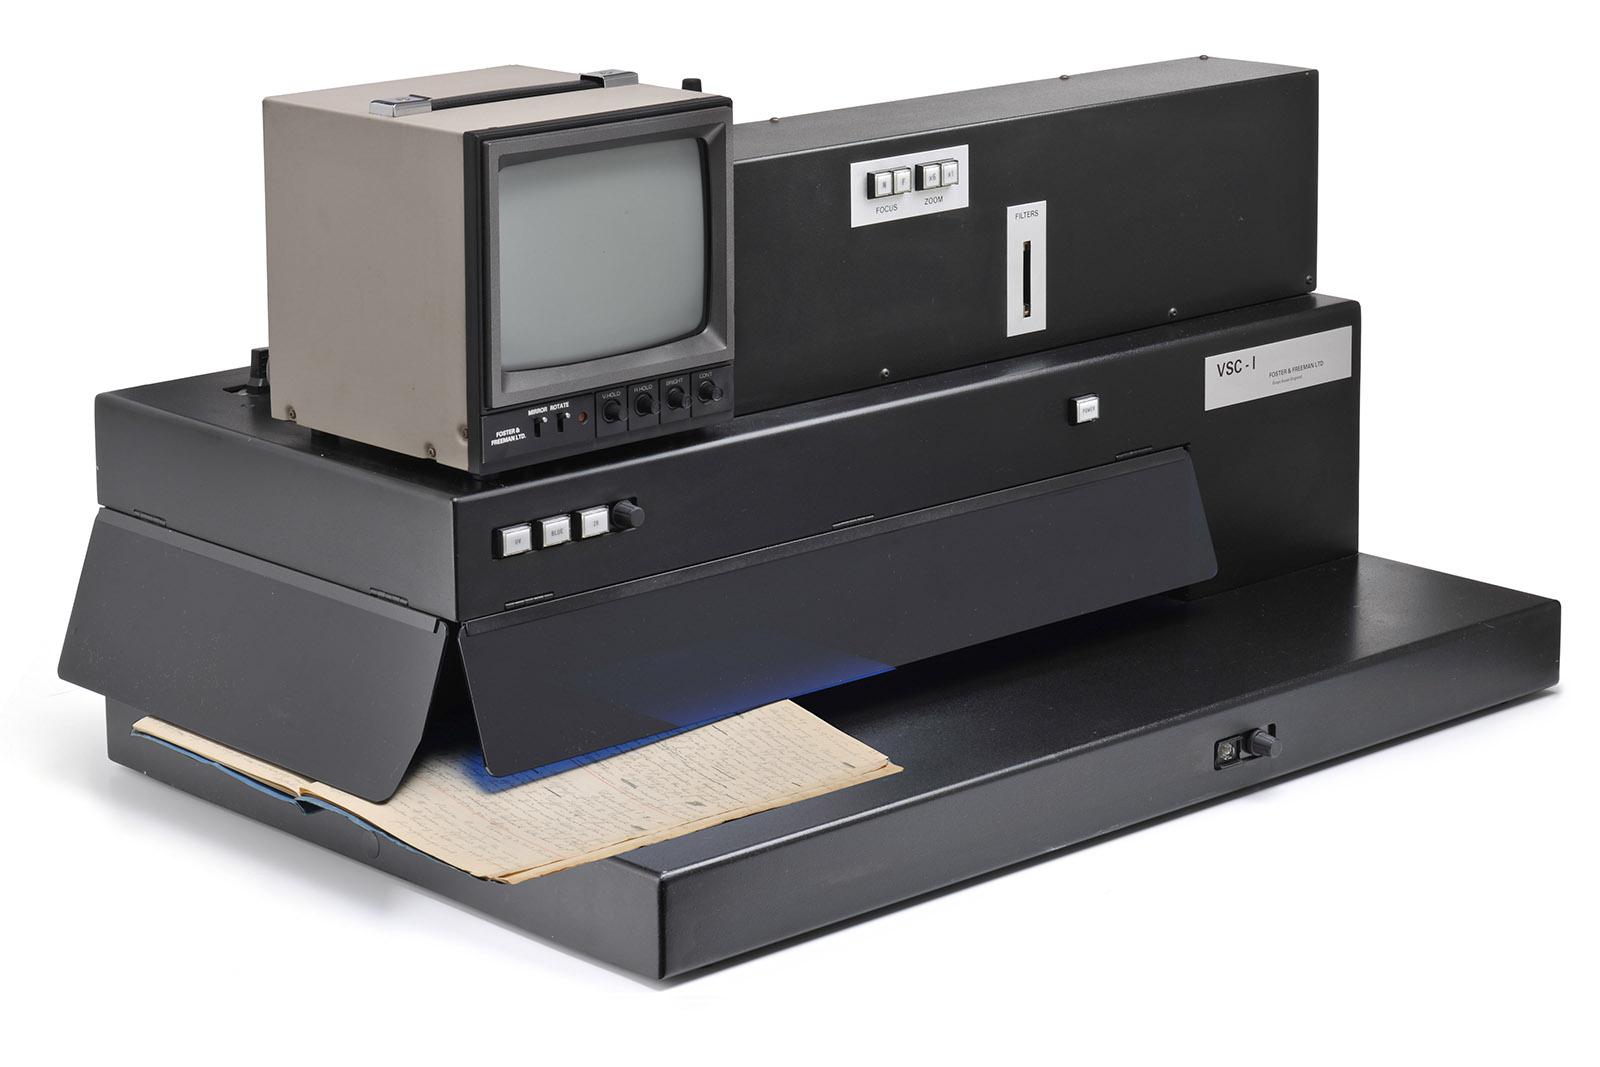 Videospektralkomparator